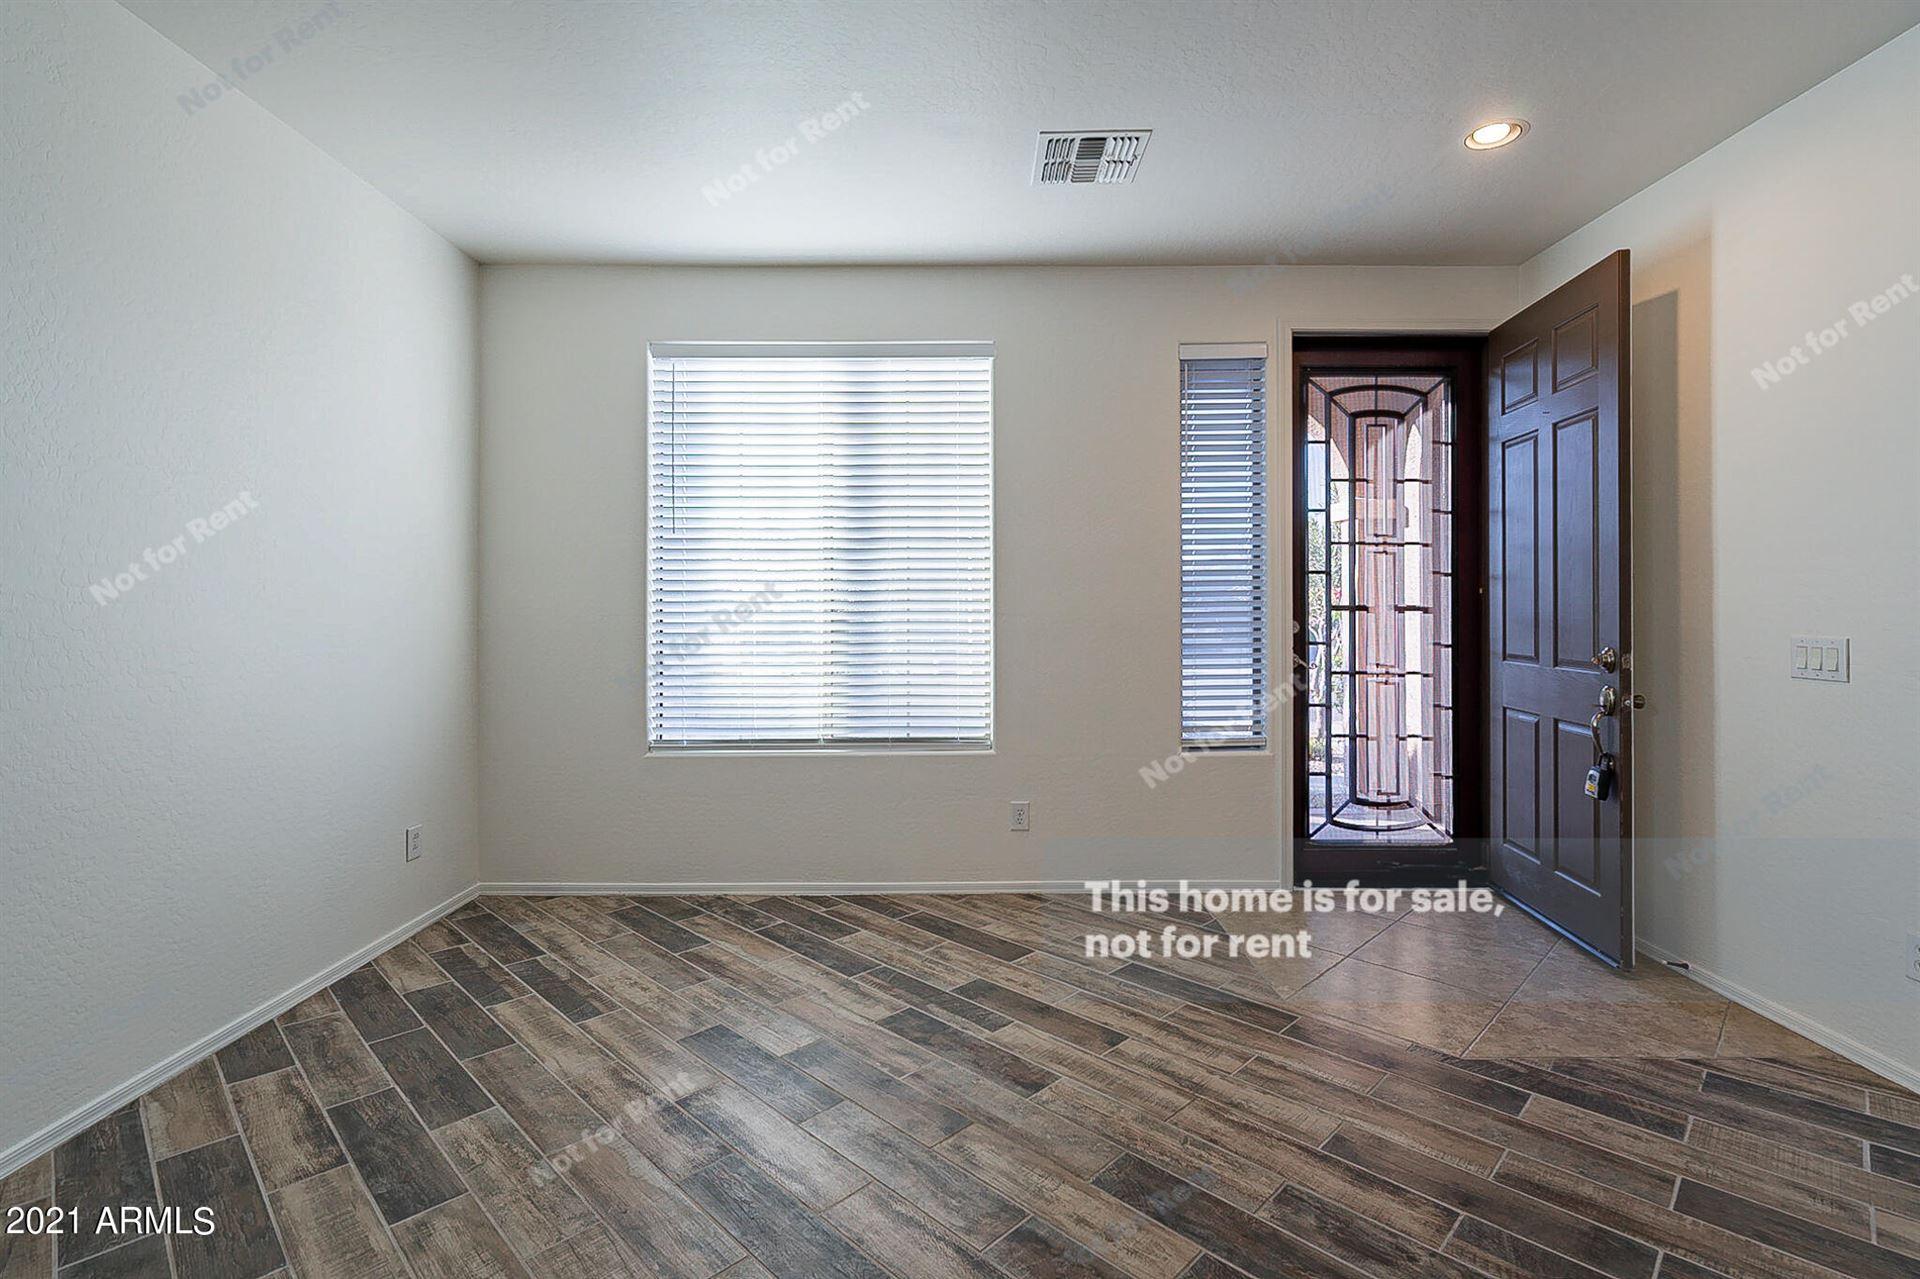 Photo of 4632 E GLENEAGLE Drive, Chandler, AZ 85249 (MLS # 6311090)